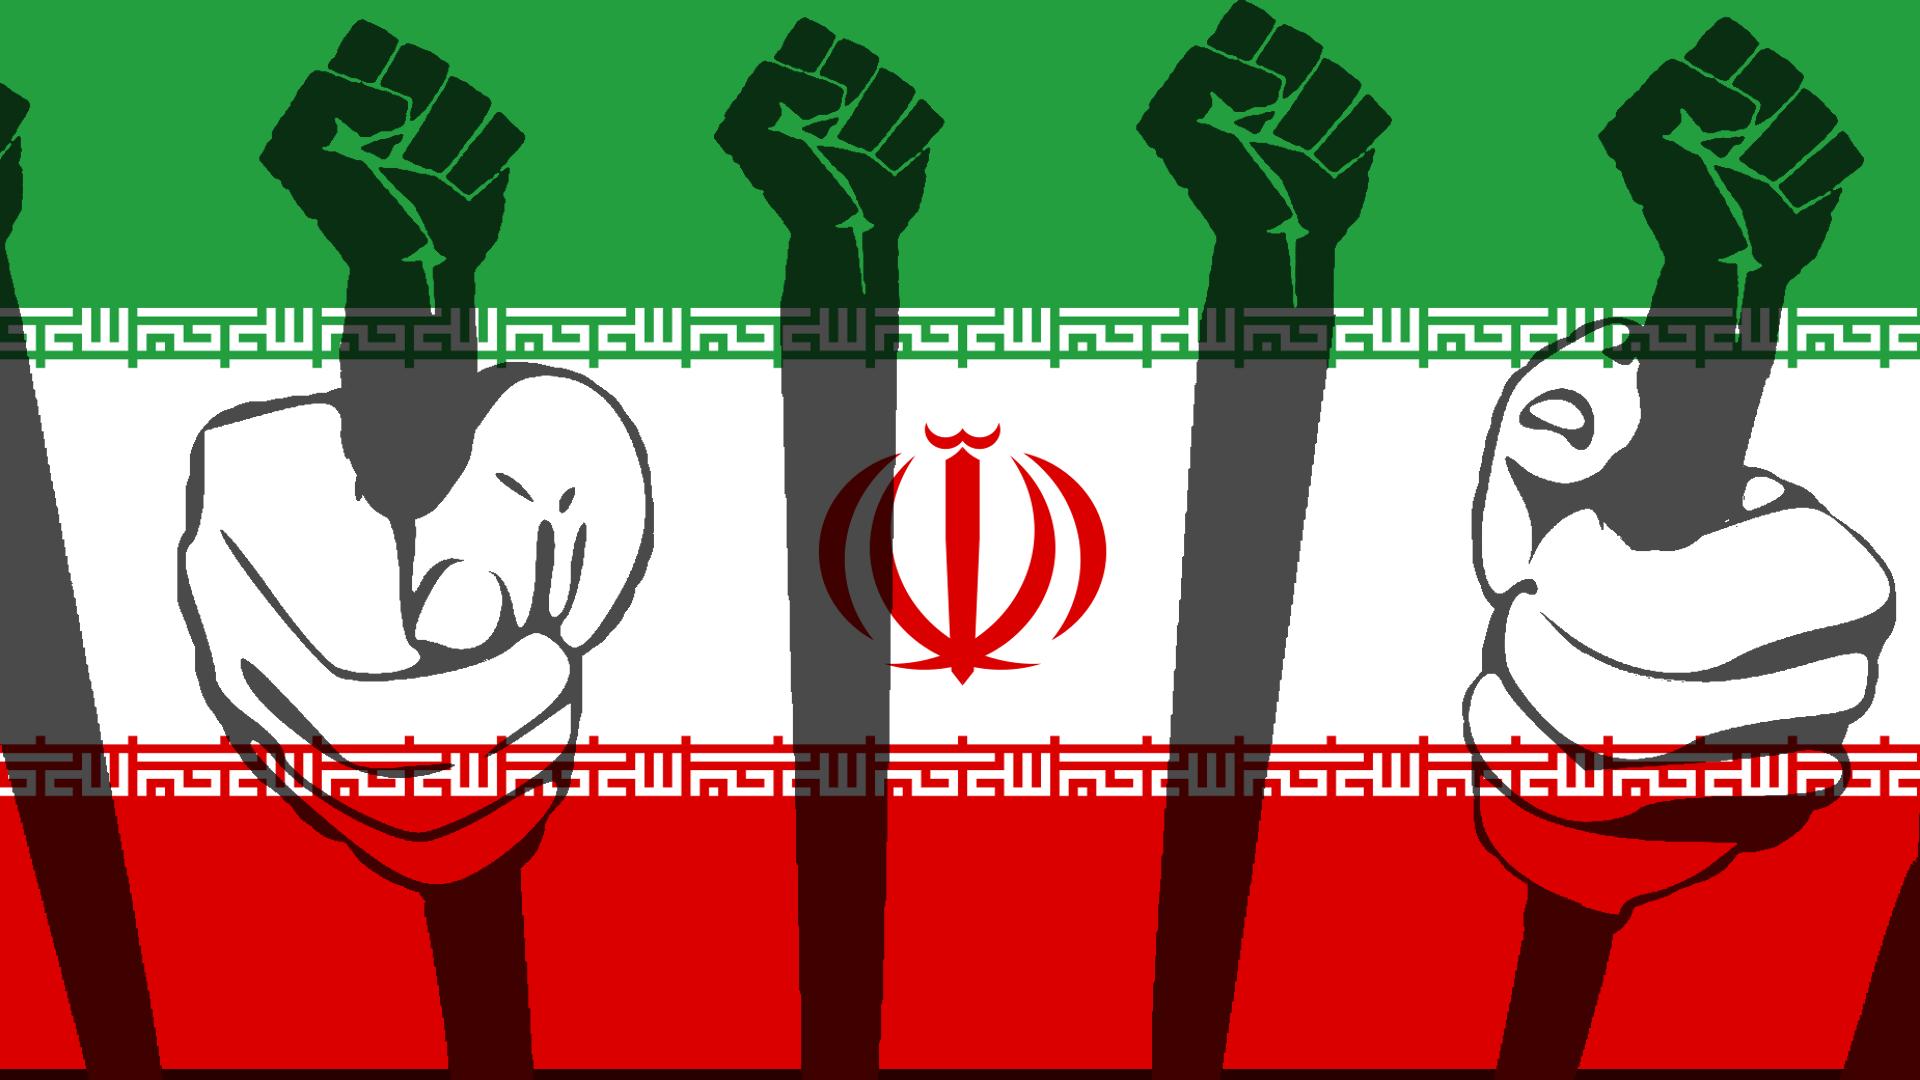 iran_image3.png